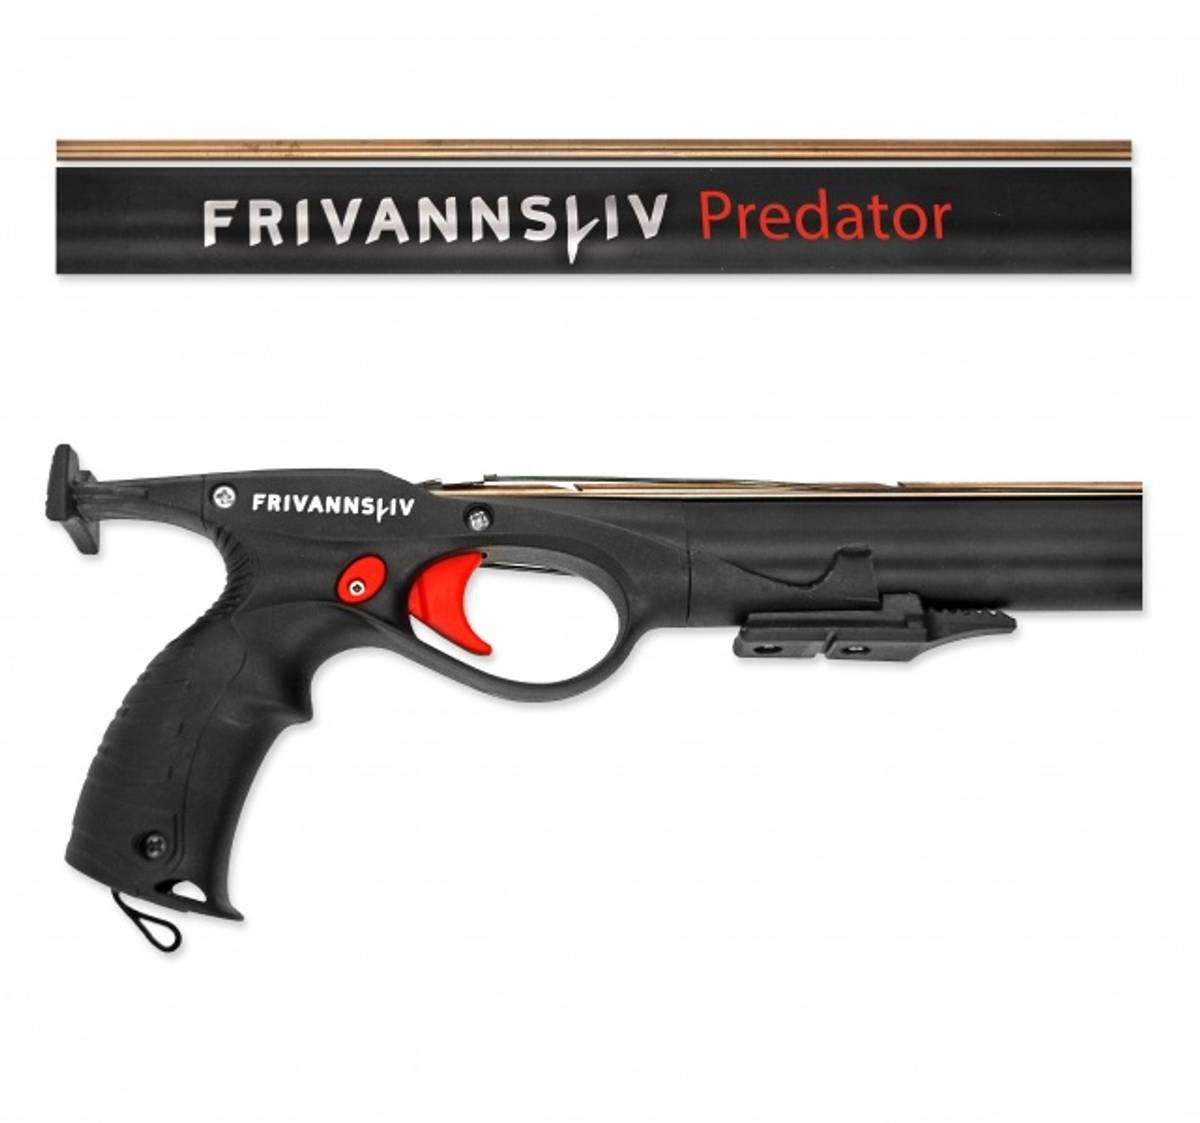 Frivannsliv® Predator